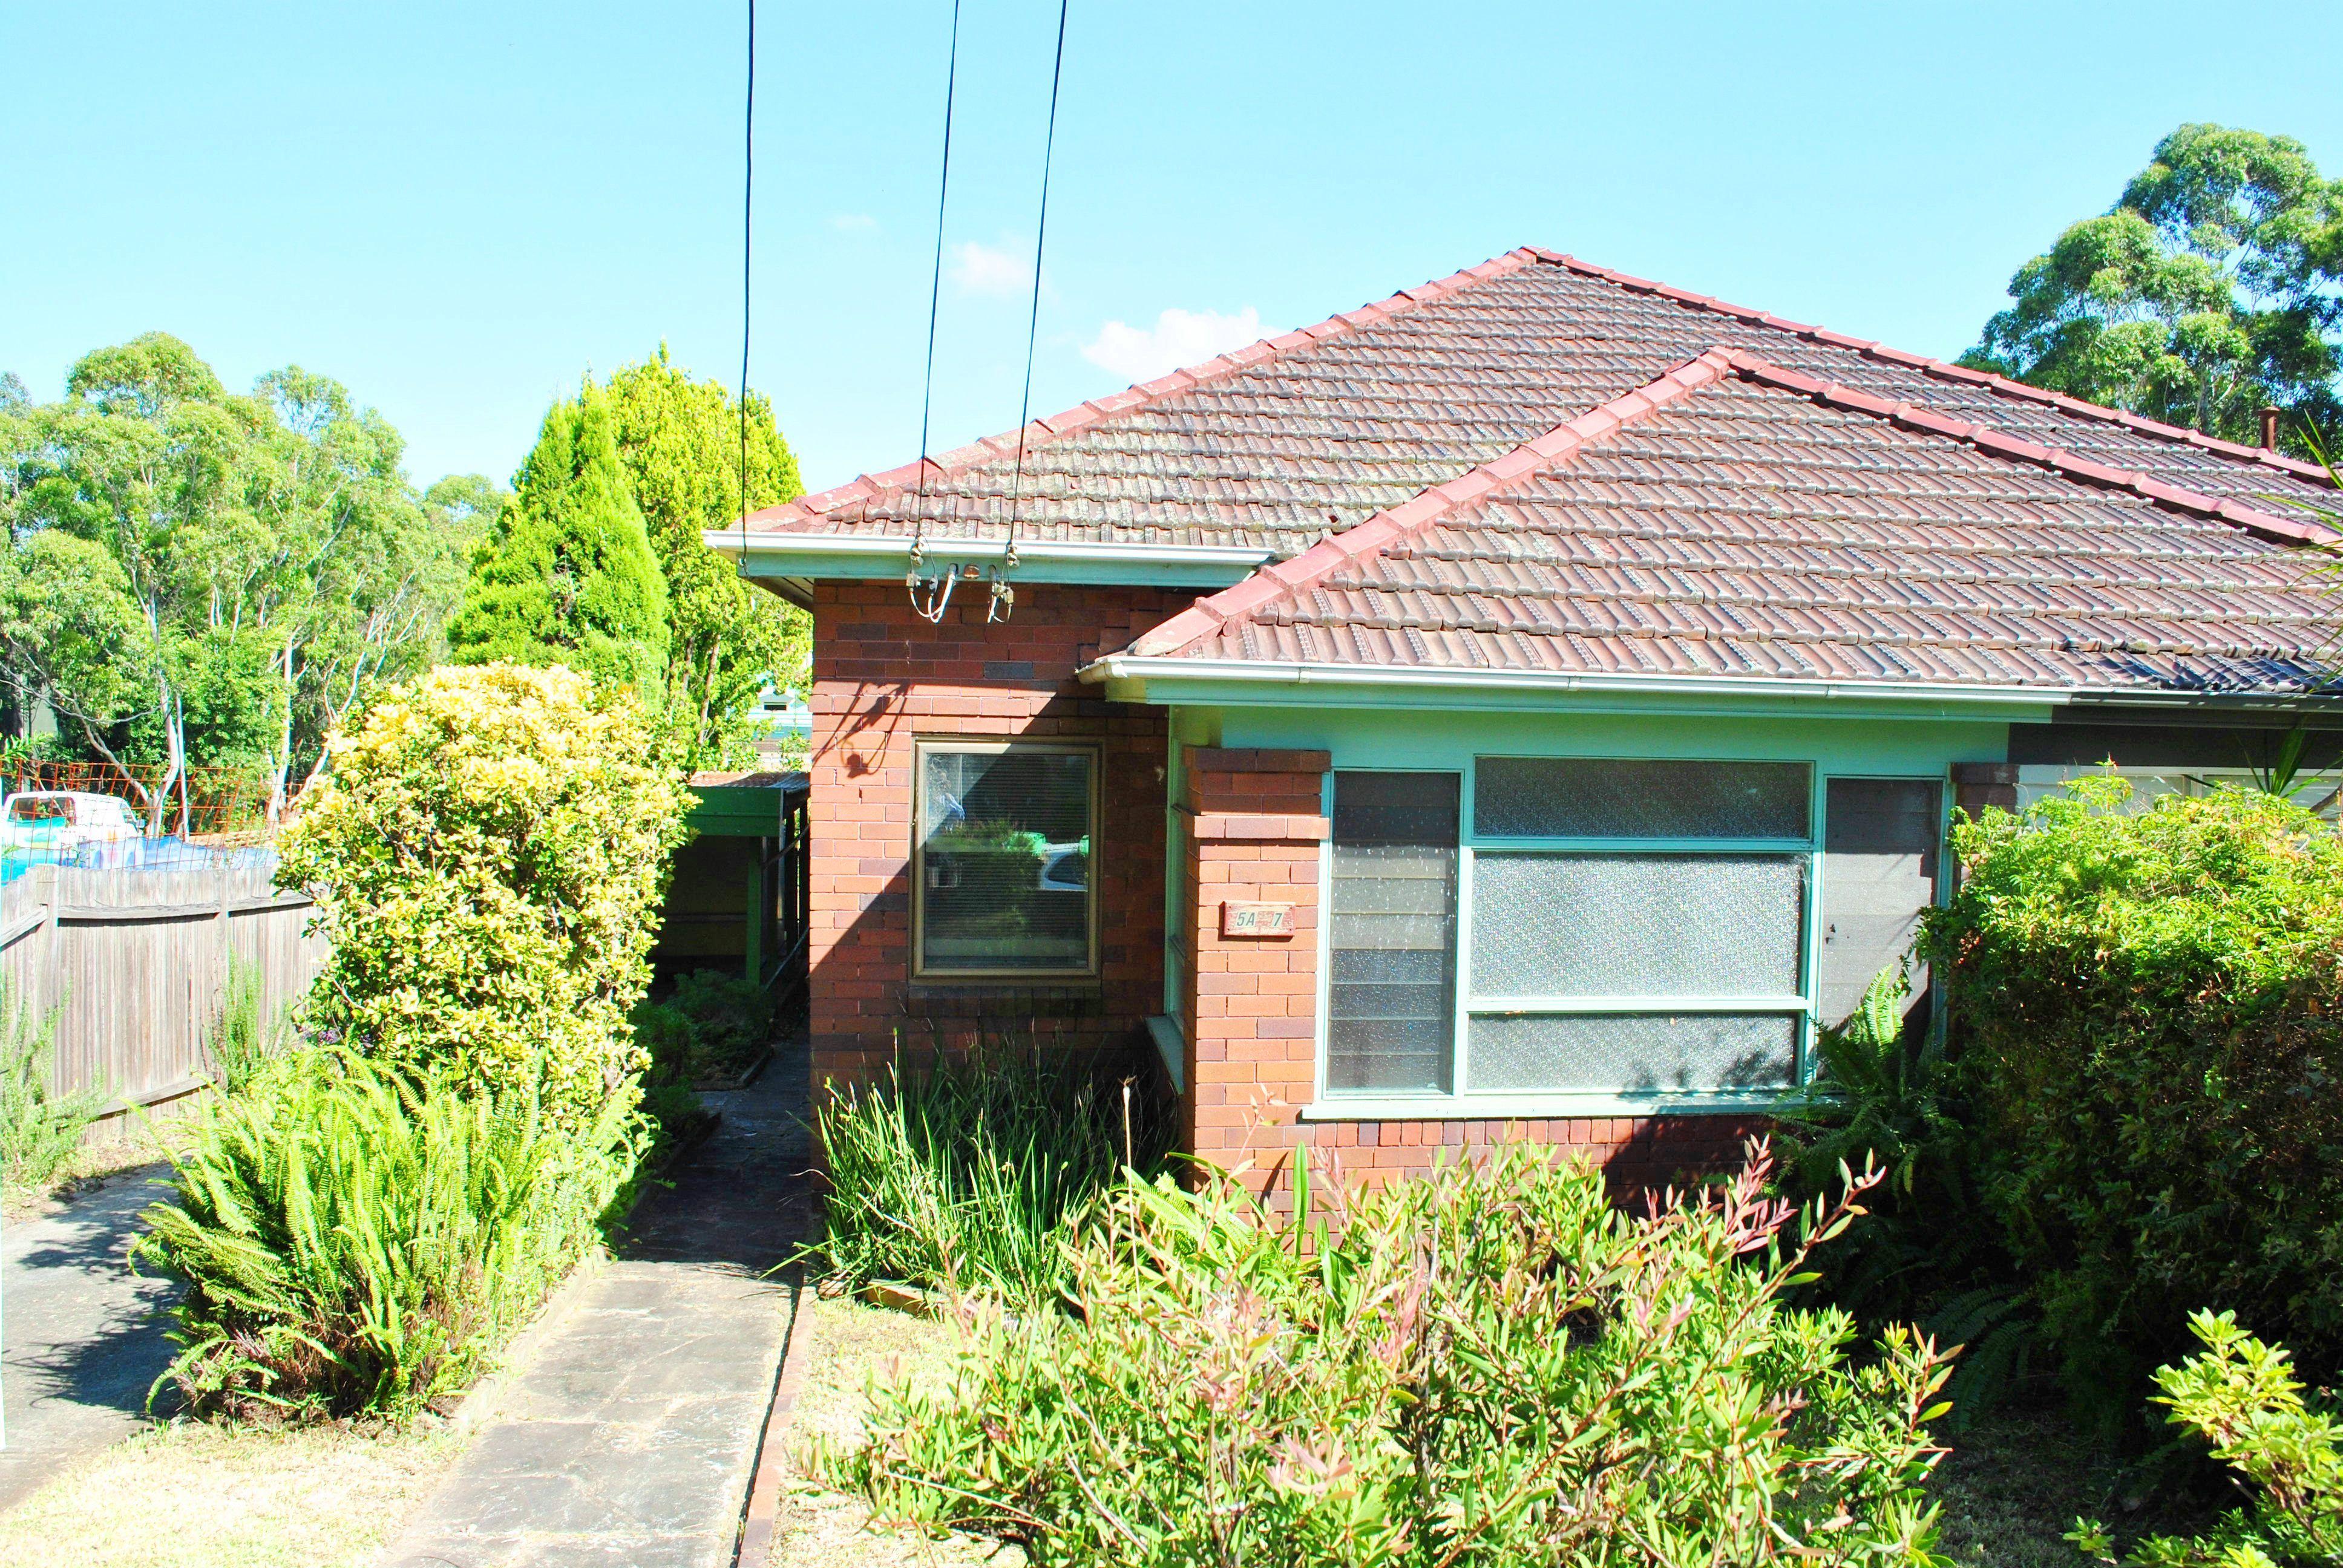 5a Verley Drive, North Strathfield NSW 2137